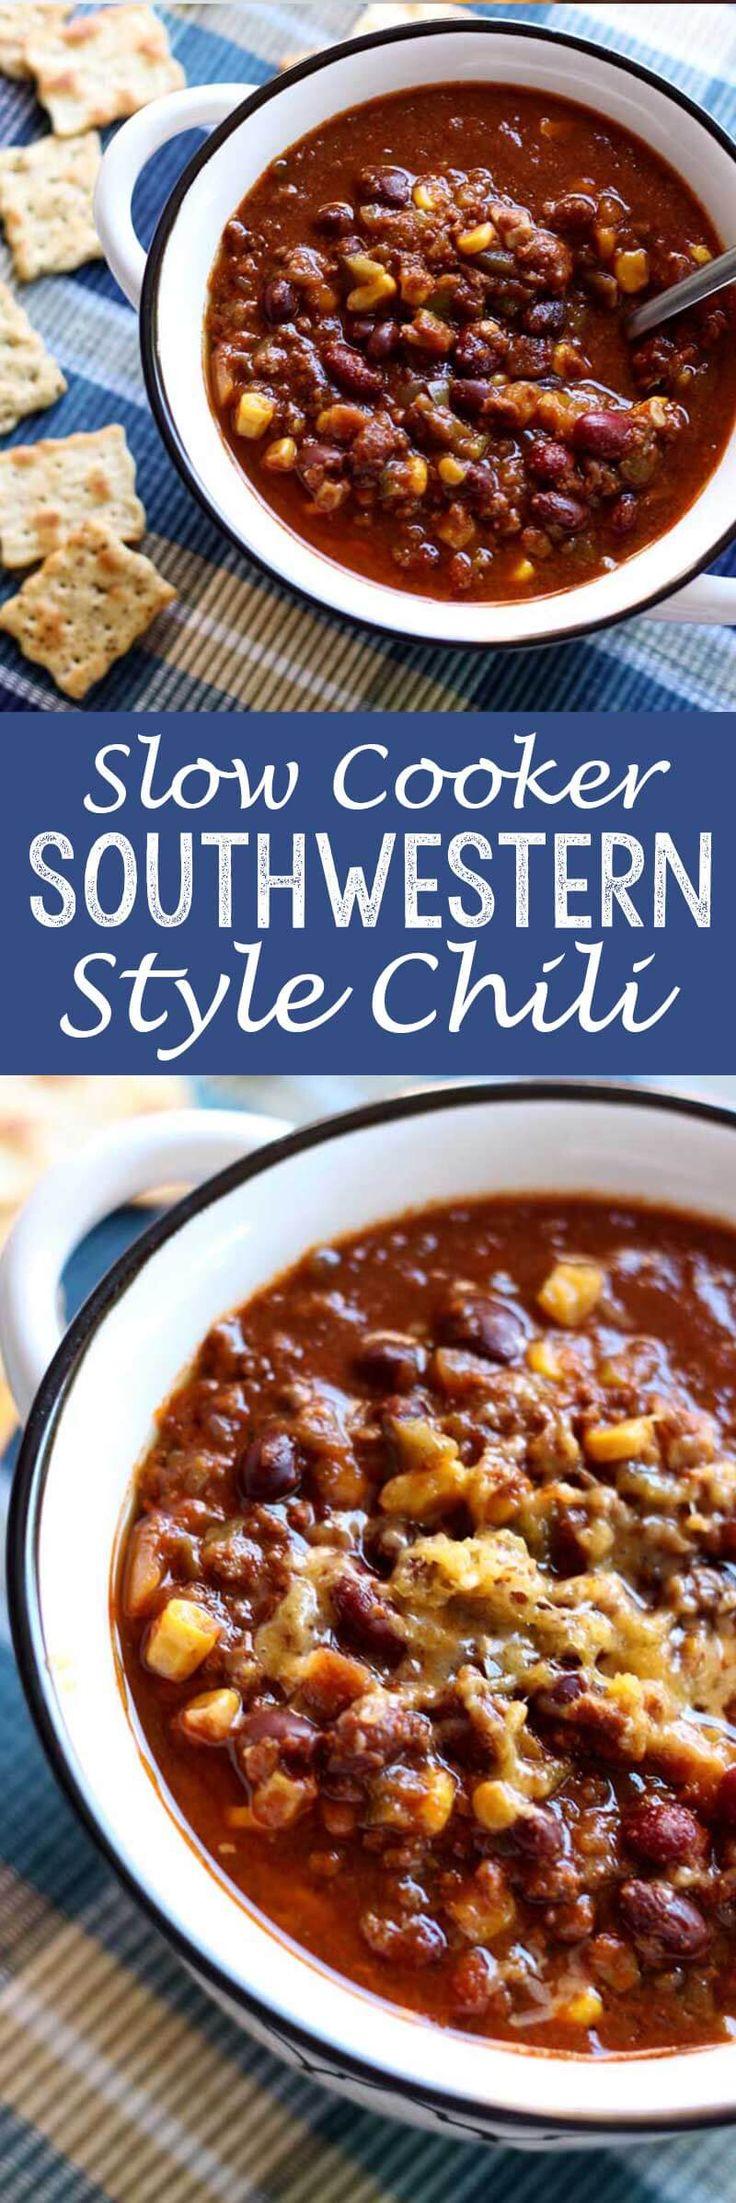 Slow-Cooker Southwestern Style Chili - Eazy Peazy Mealz